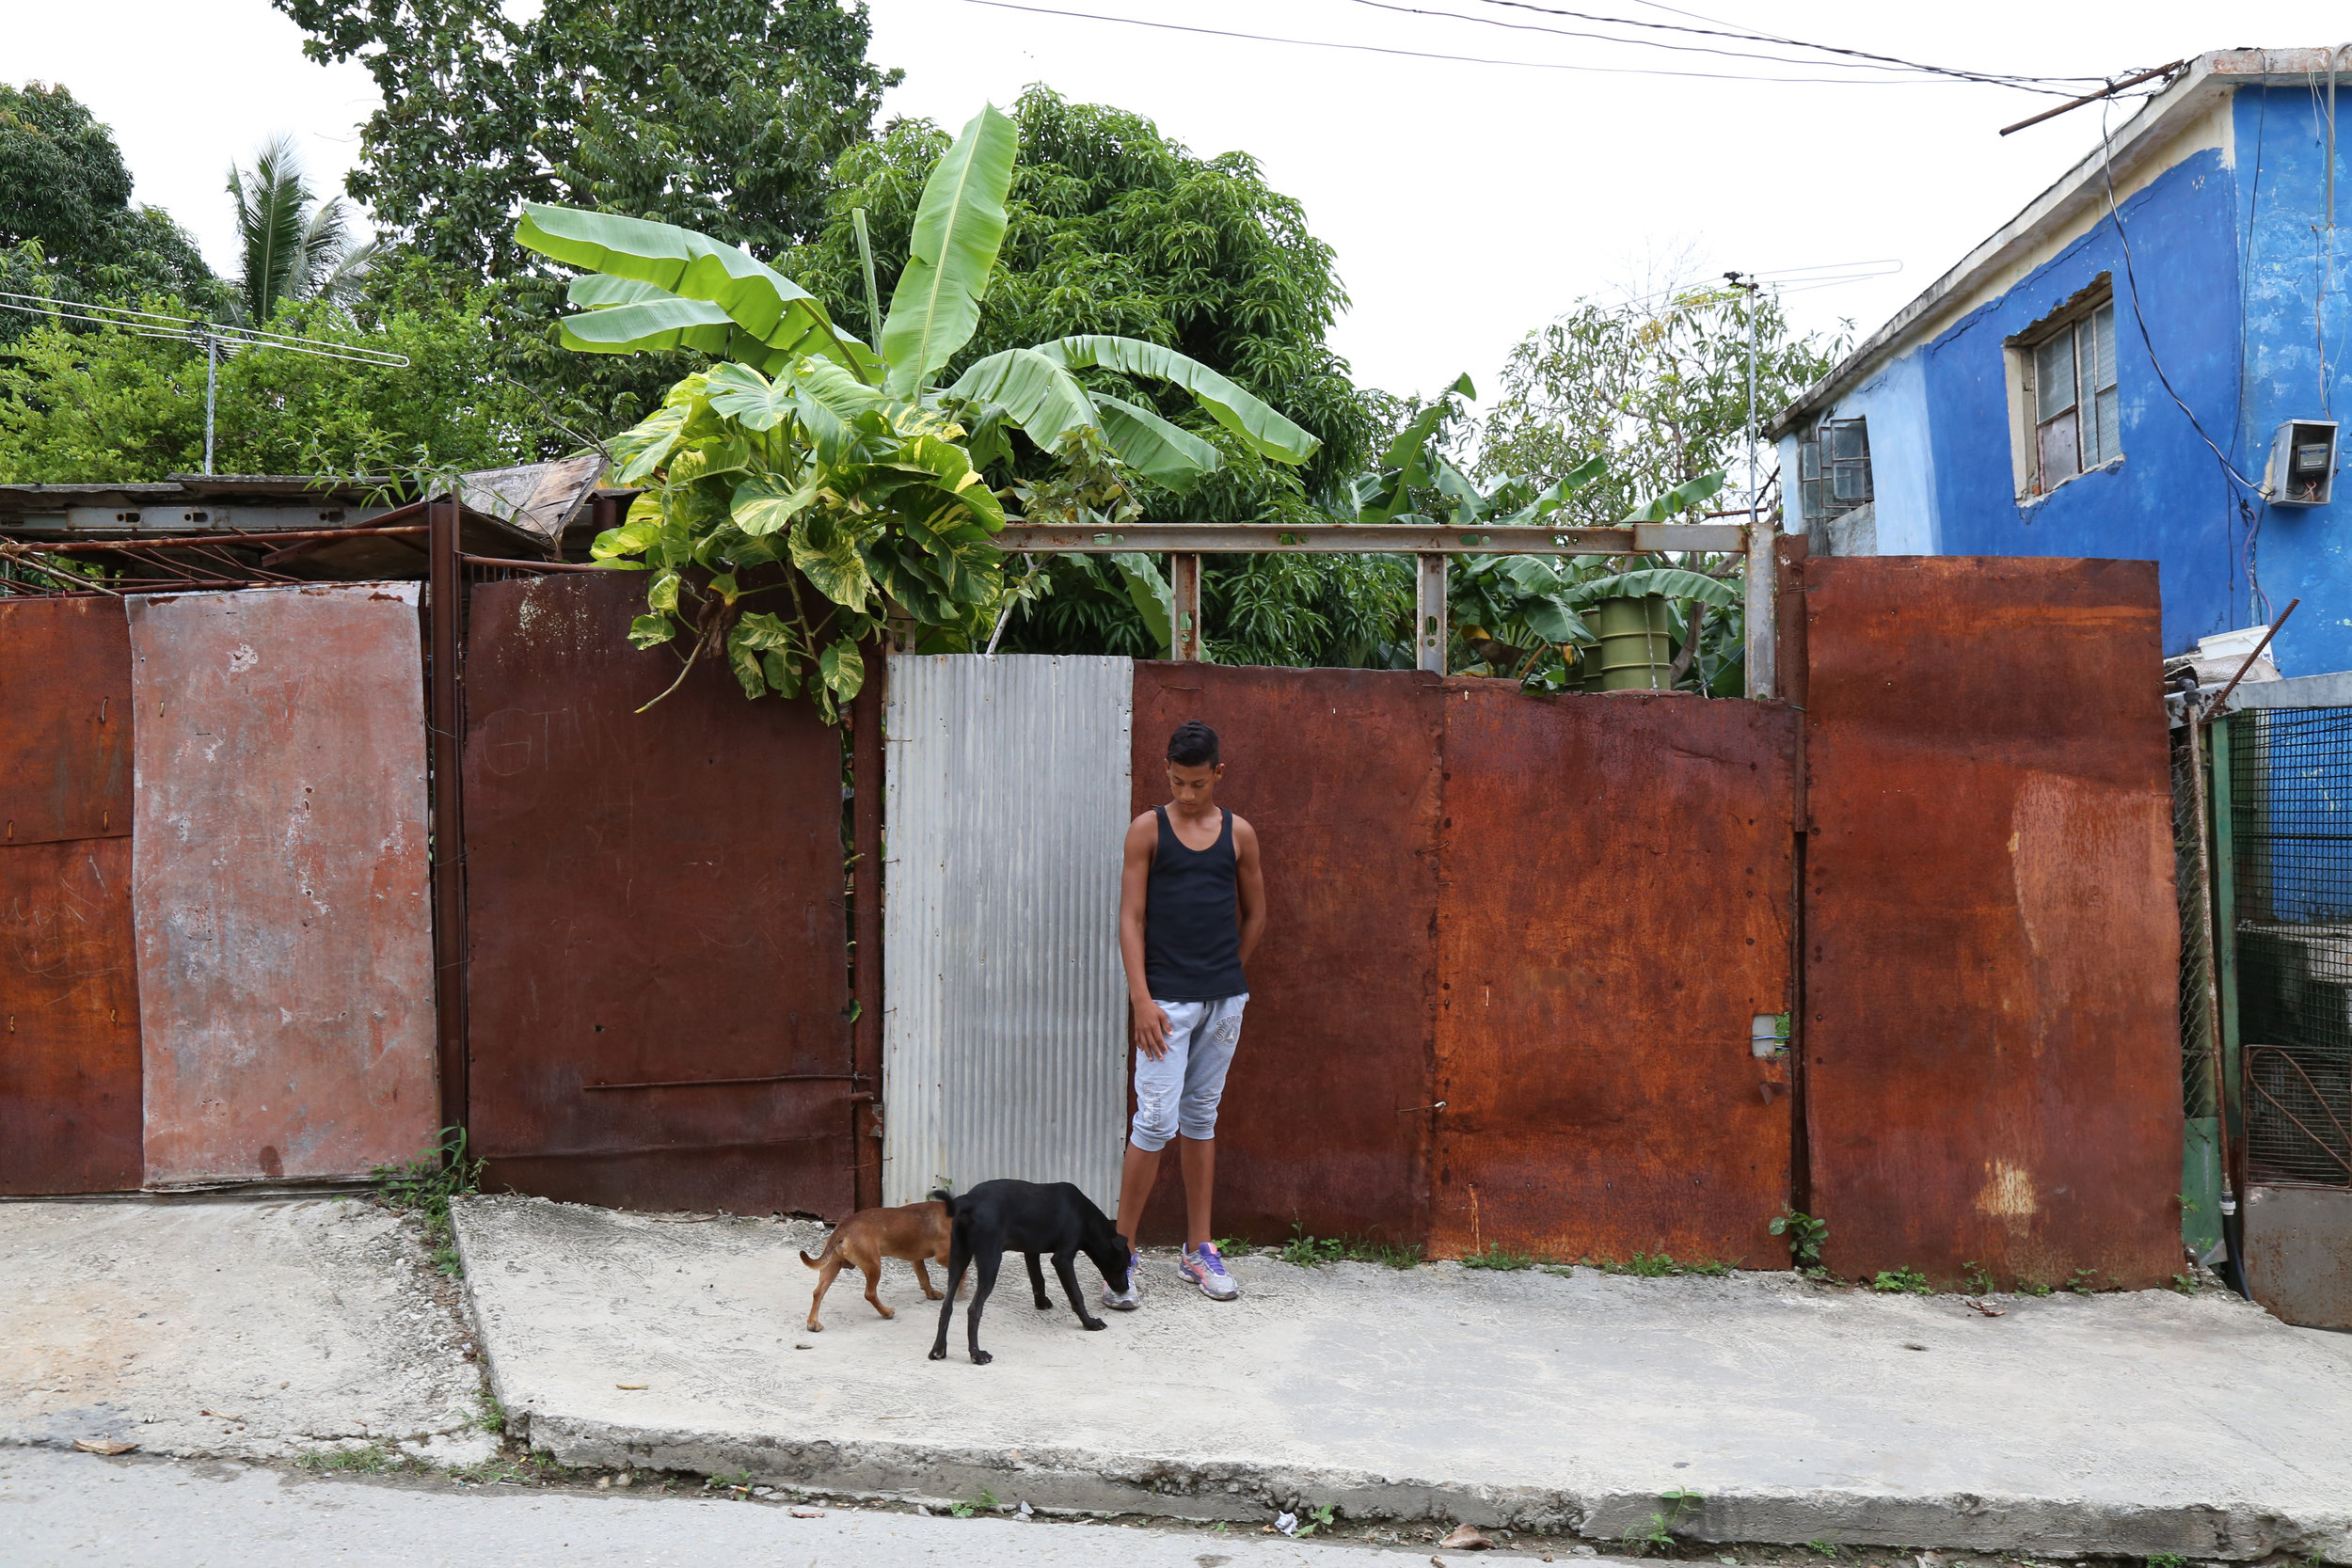 GeoAdo_Cuba_Livan-3.jpg